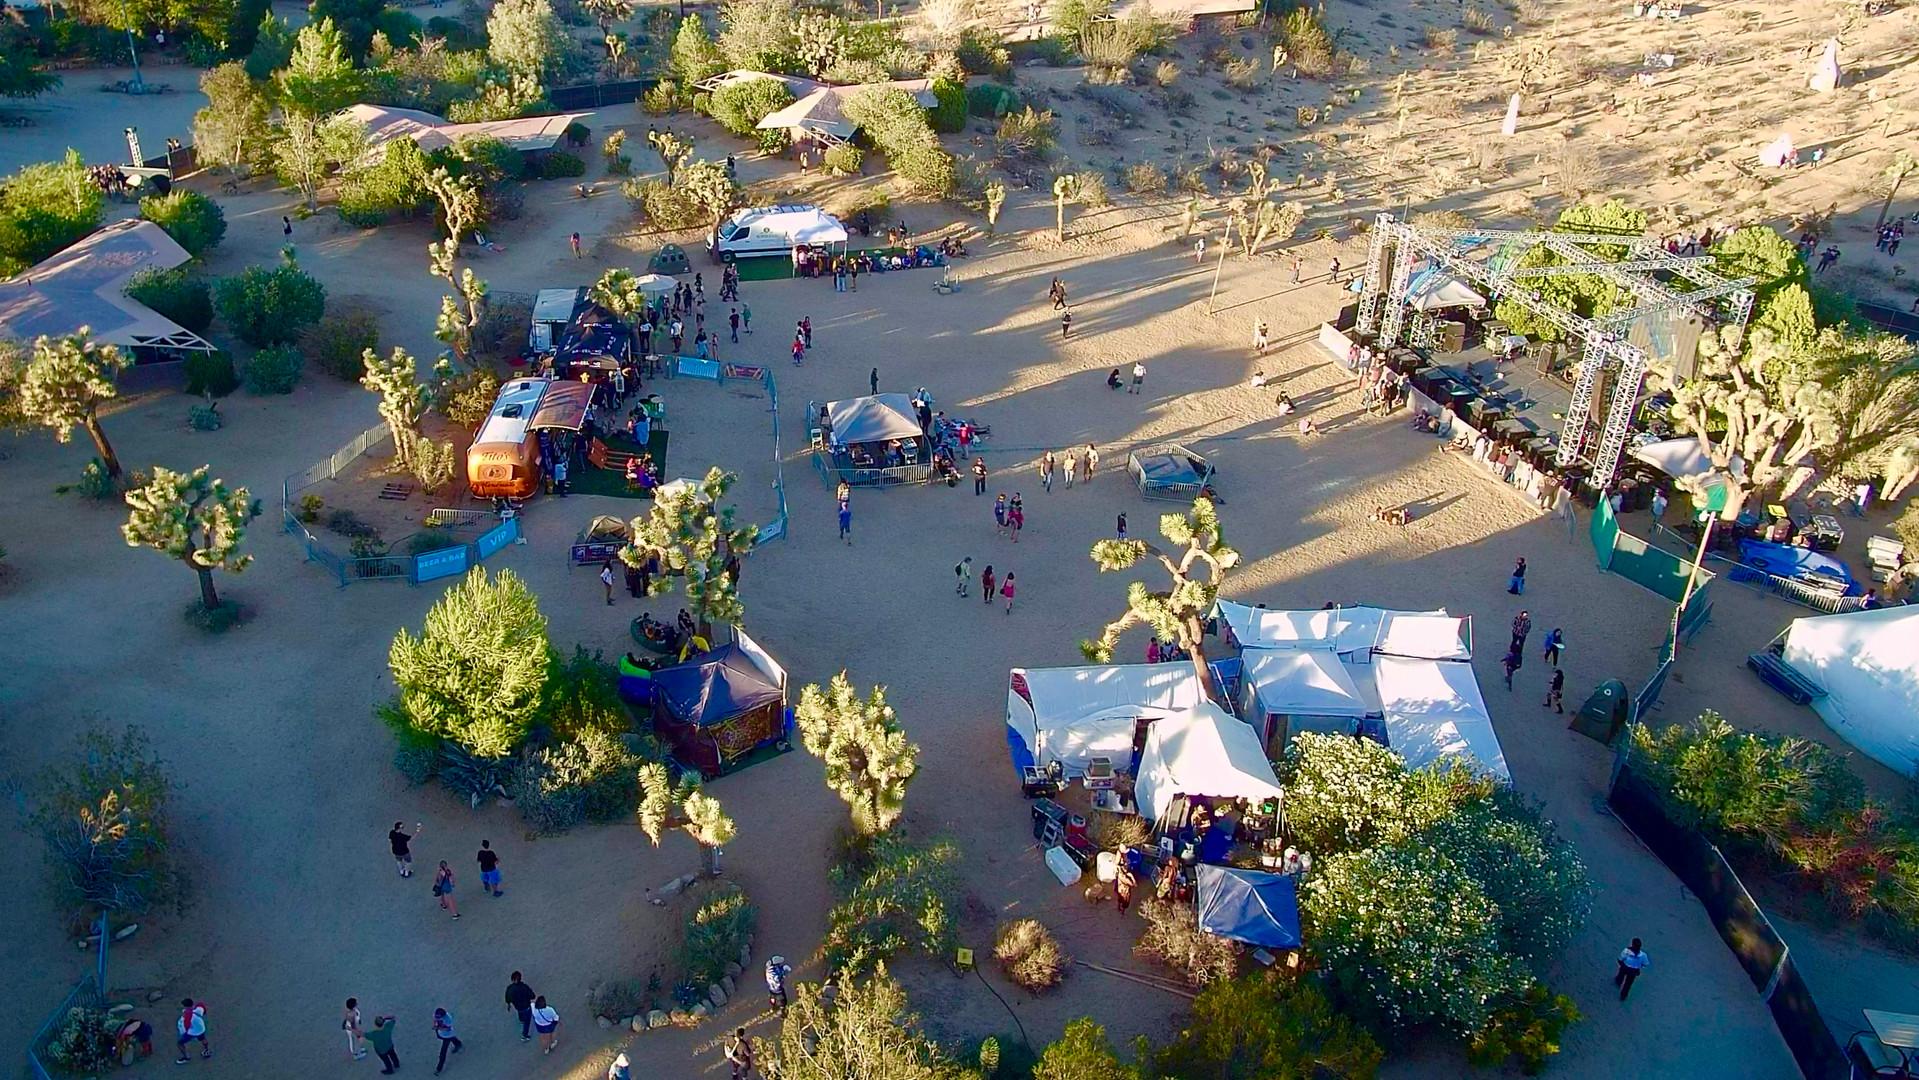 DESERT DAZE 2016 MAIN STAGE